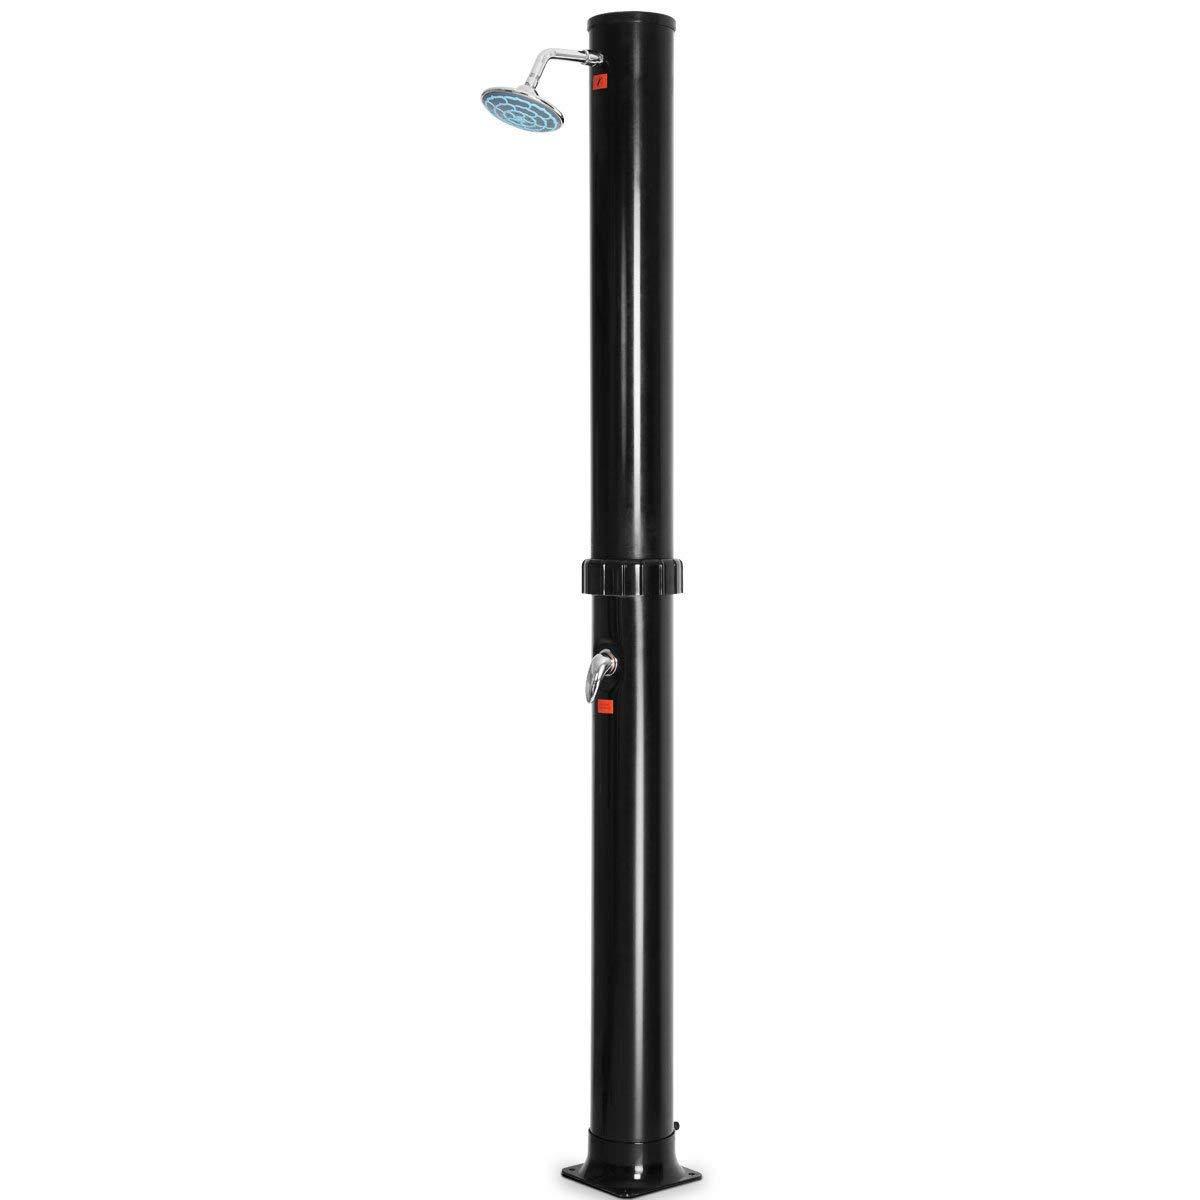 Get Quotations Fdinspiration Black 85 5 Portable Pvc Outdoor Solar Shower Free Standing Capacity 9 Gallon W